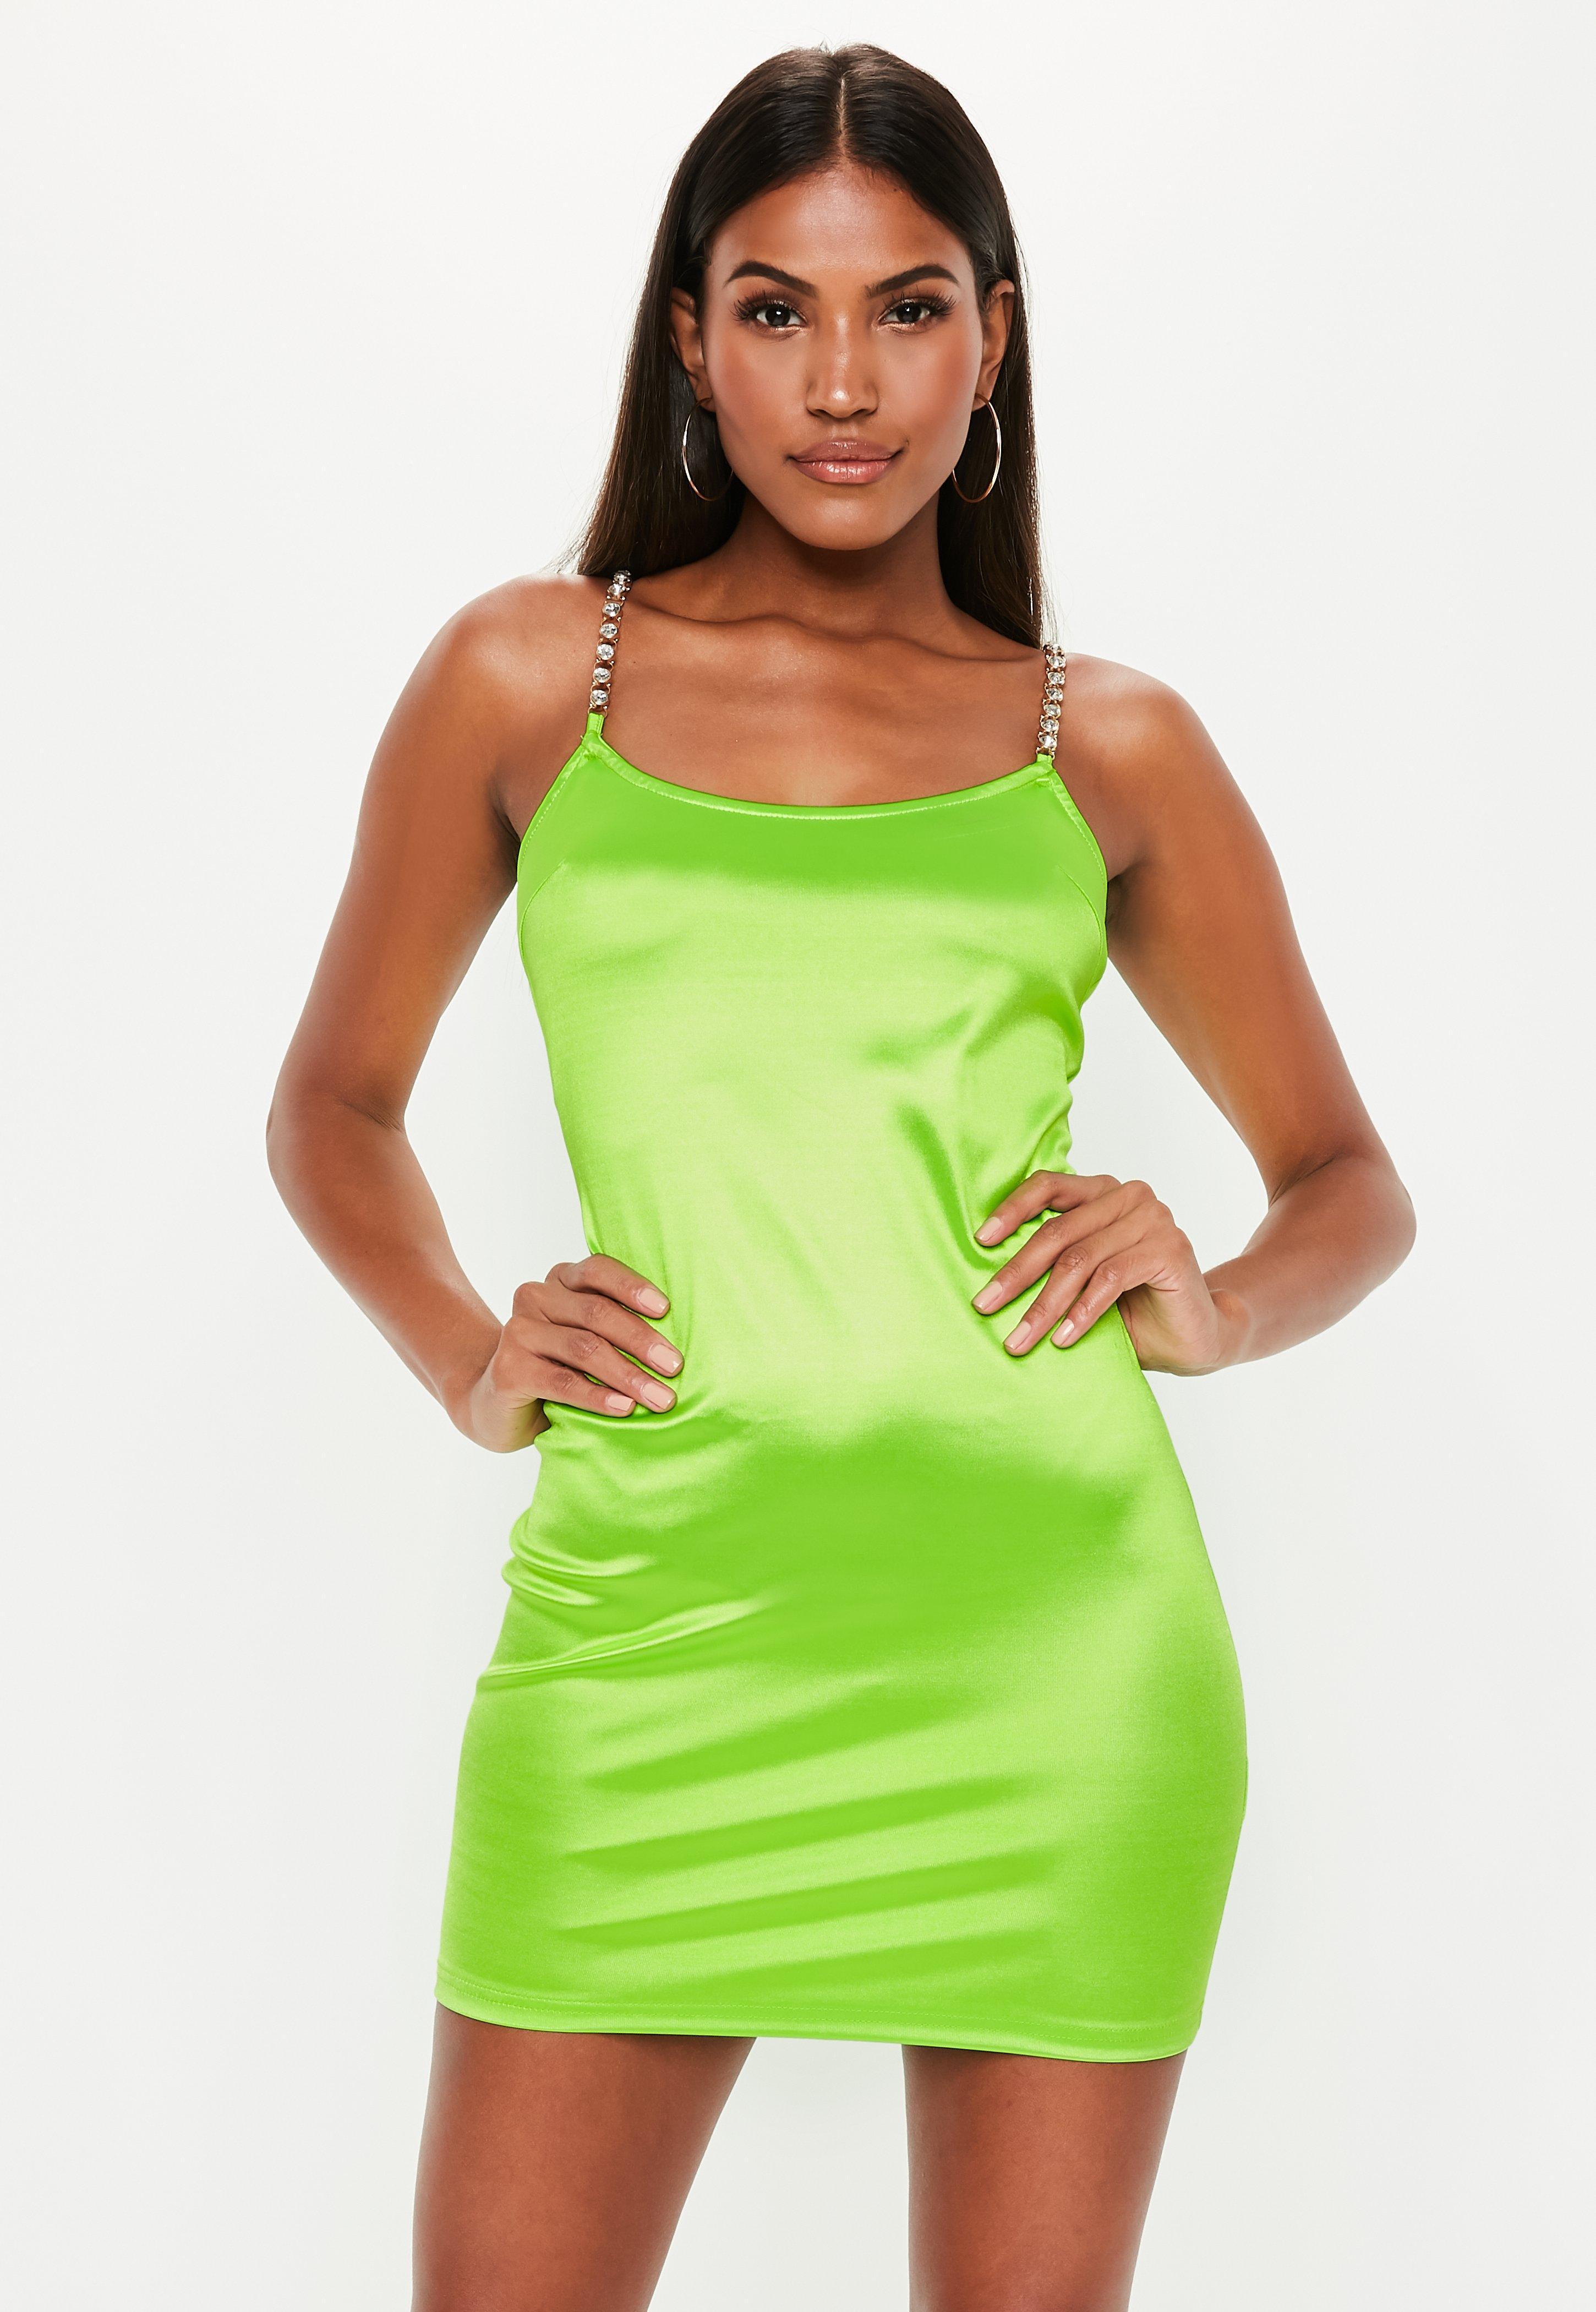 c2cf4e7039ae Missguided - Green Diamante Strap Stretch Satin Mini Dress - Lyst. View  fullscreen